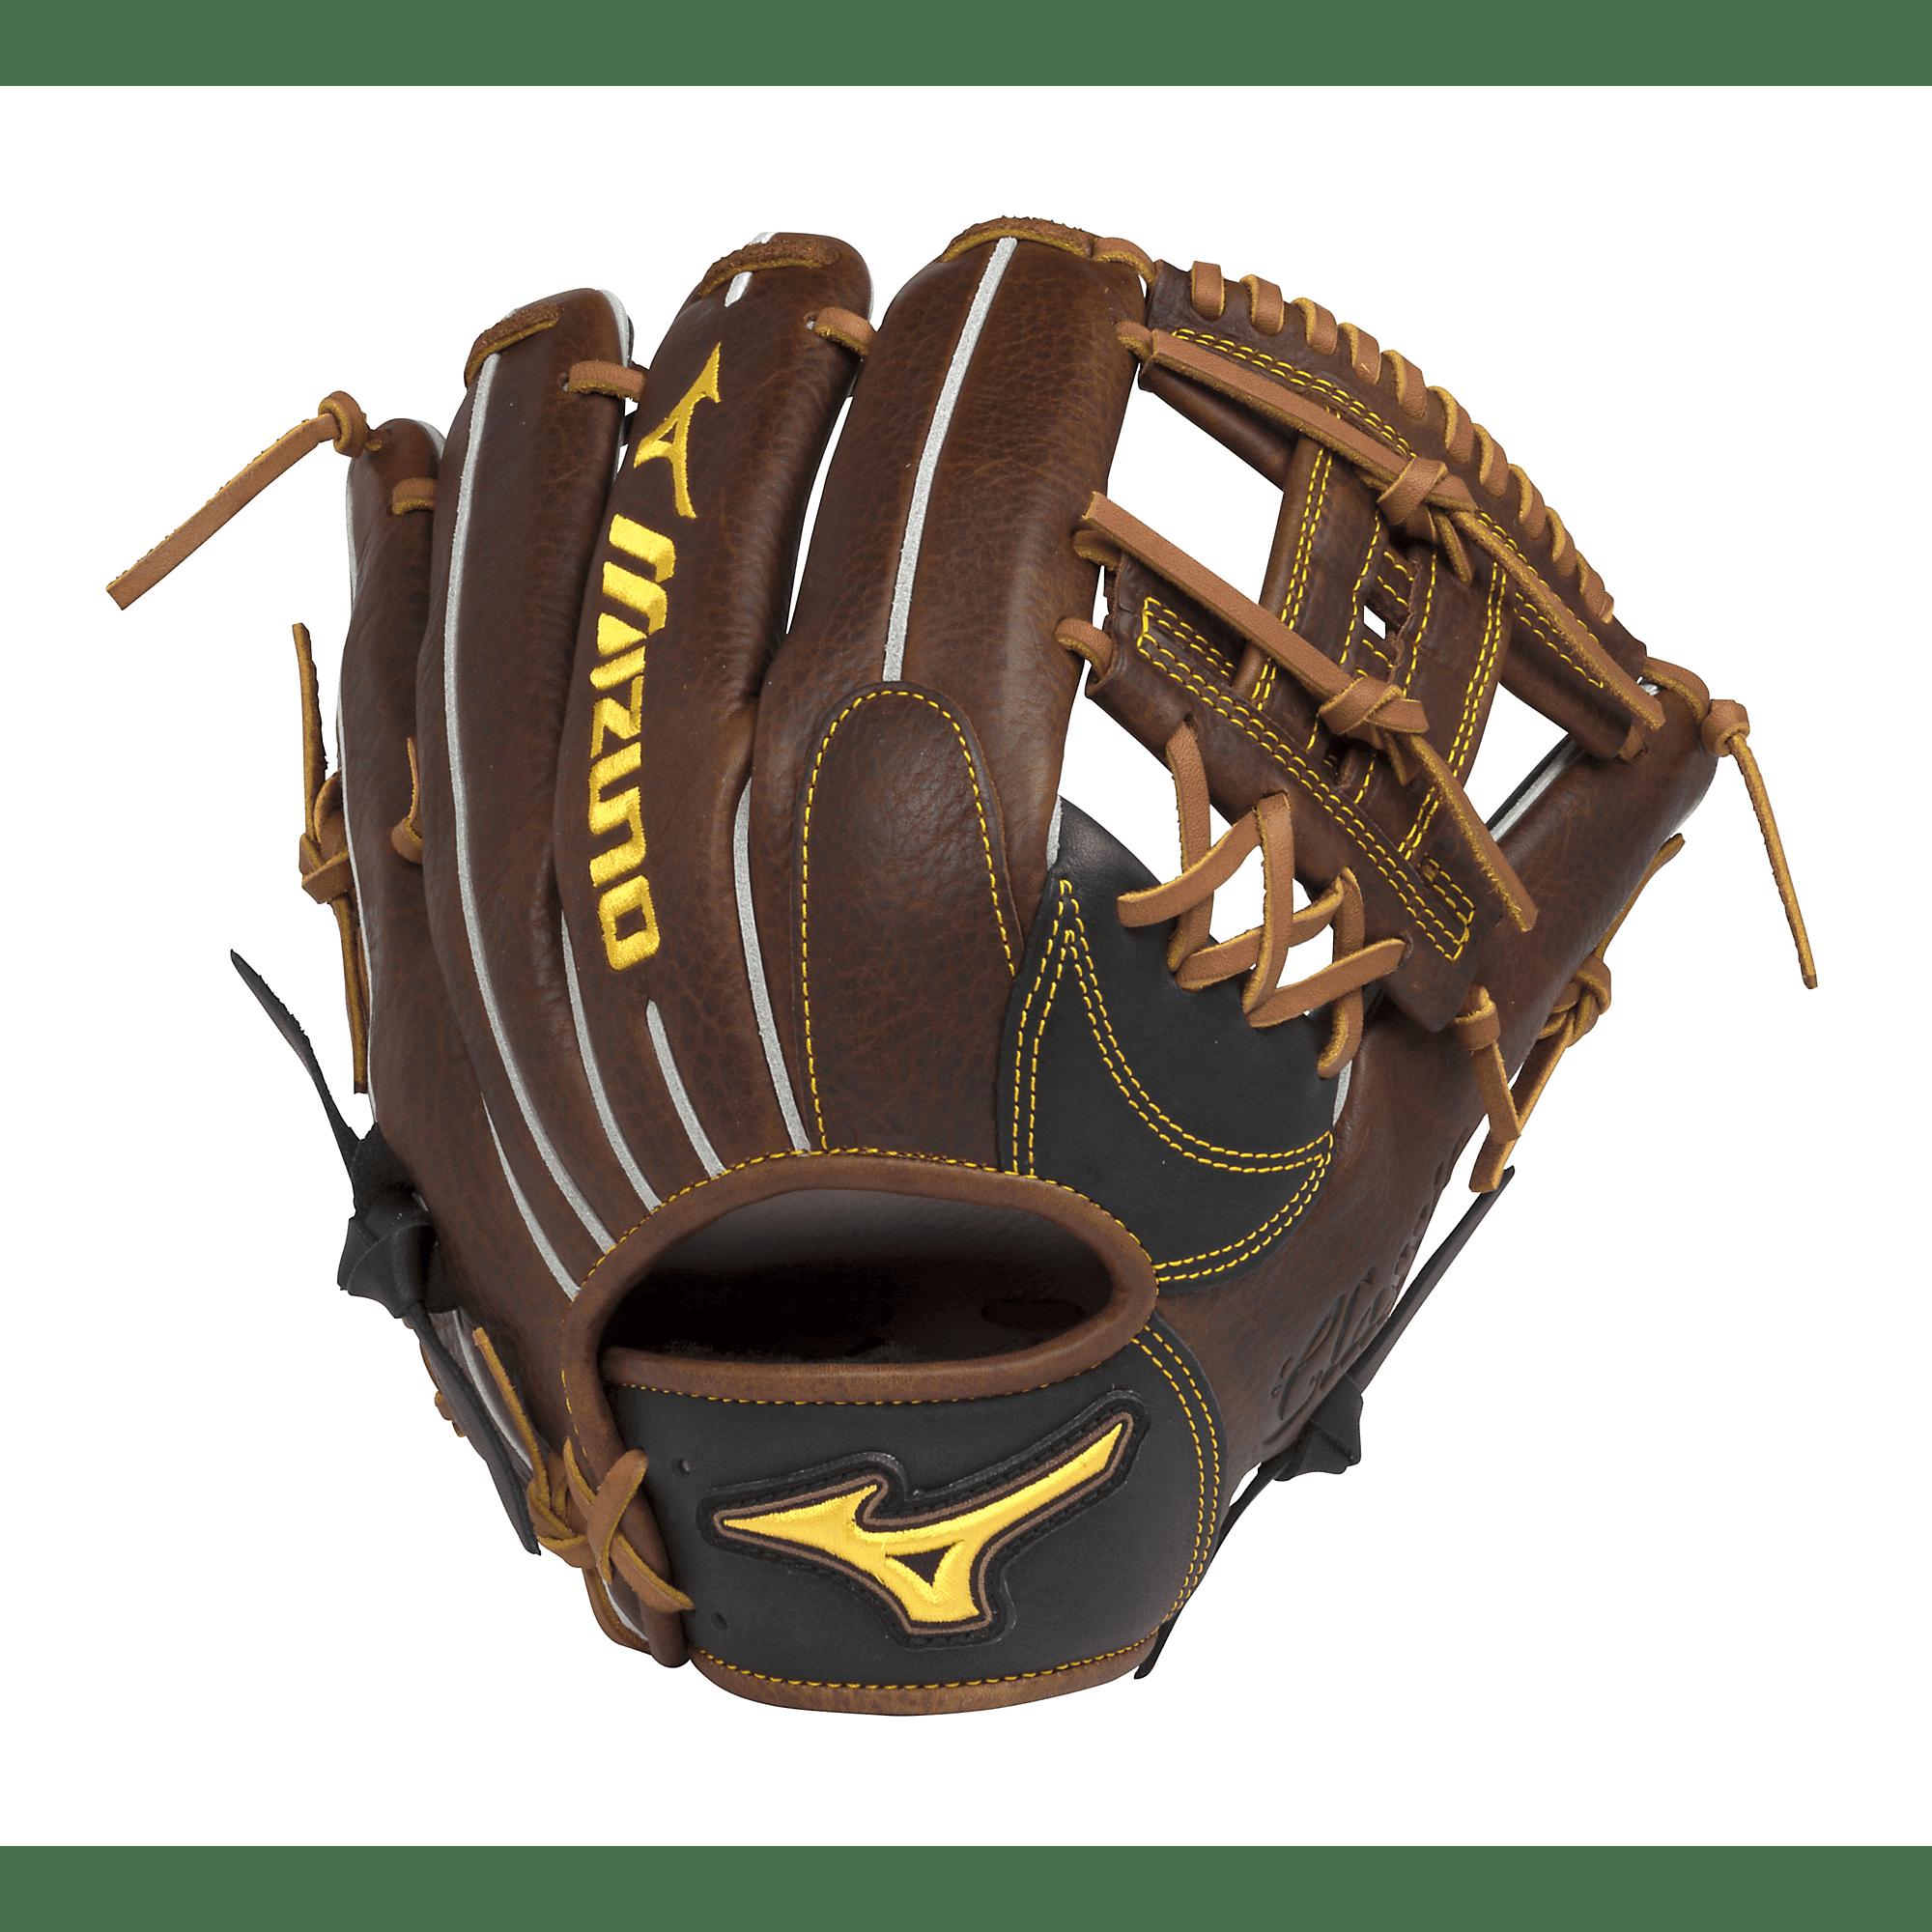 "Mizuno 11.5"" Classic Pro Soft Series Infield Glove"